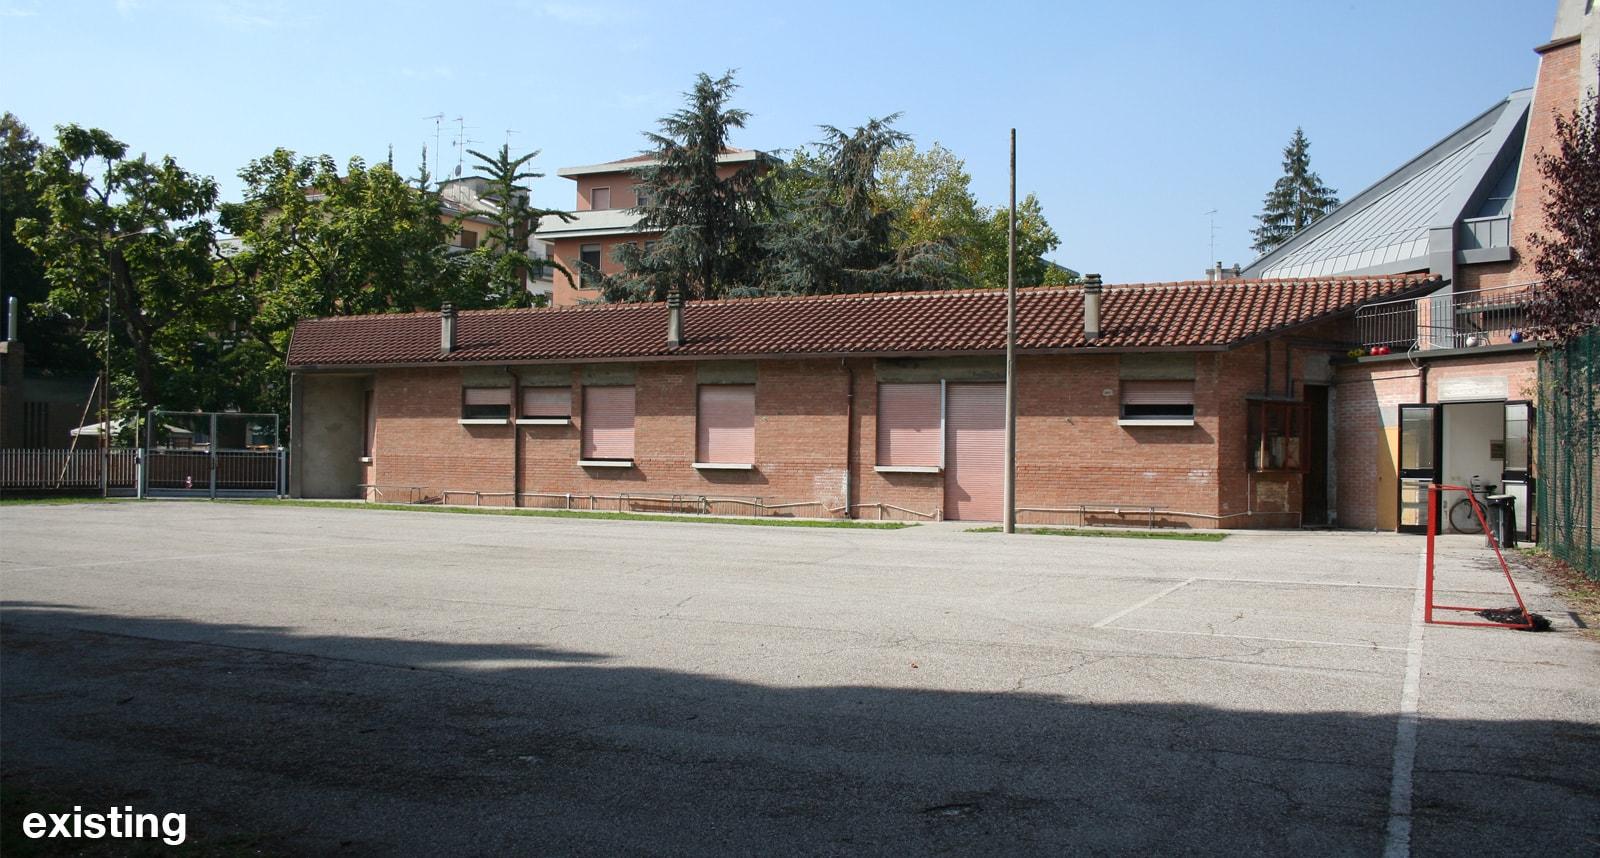 parrocchia-immacolata-existing-external-02